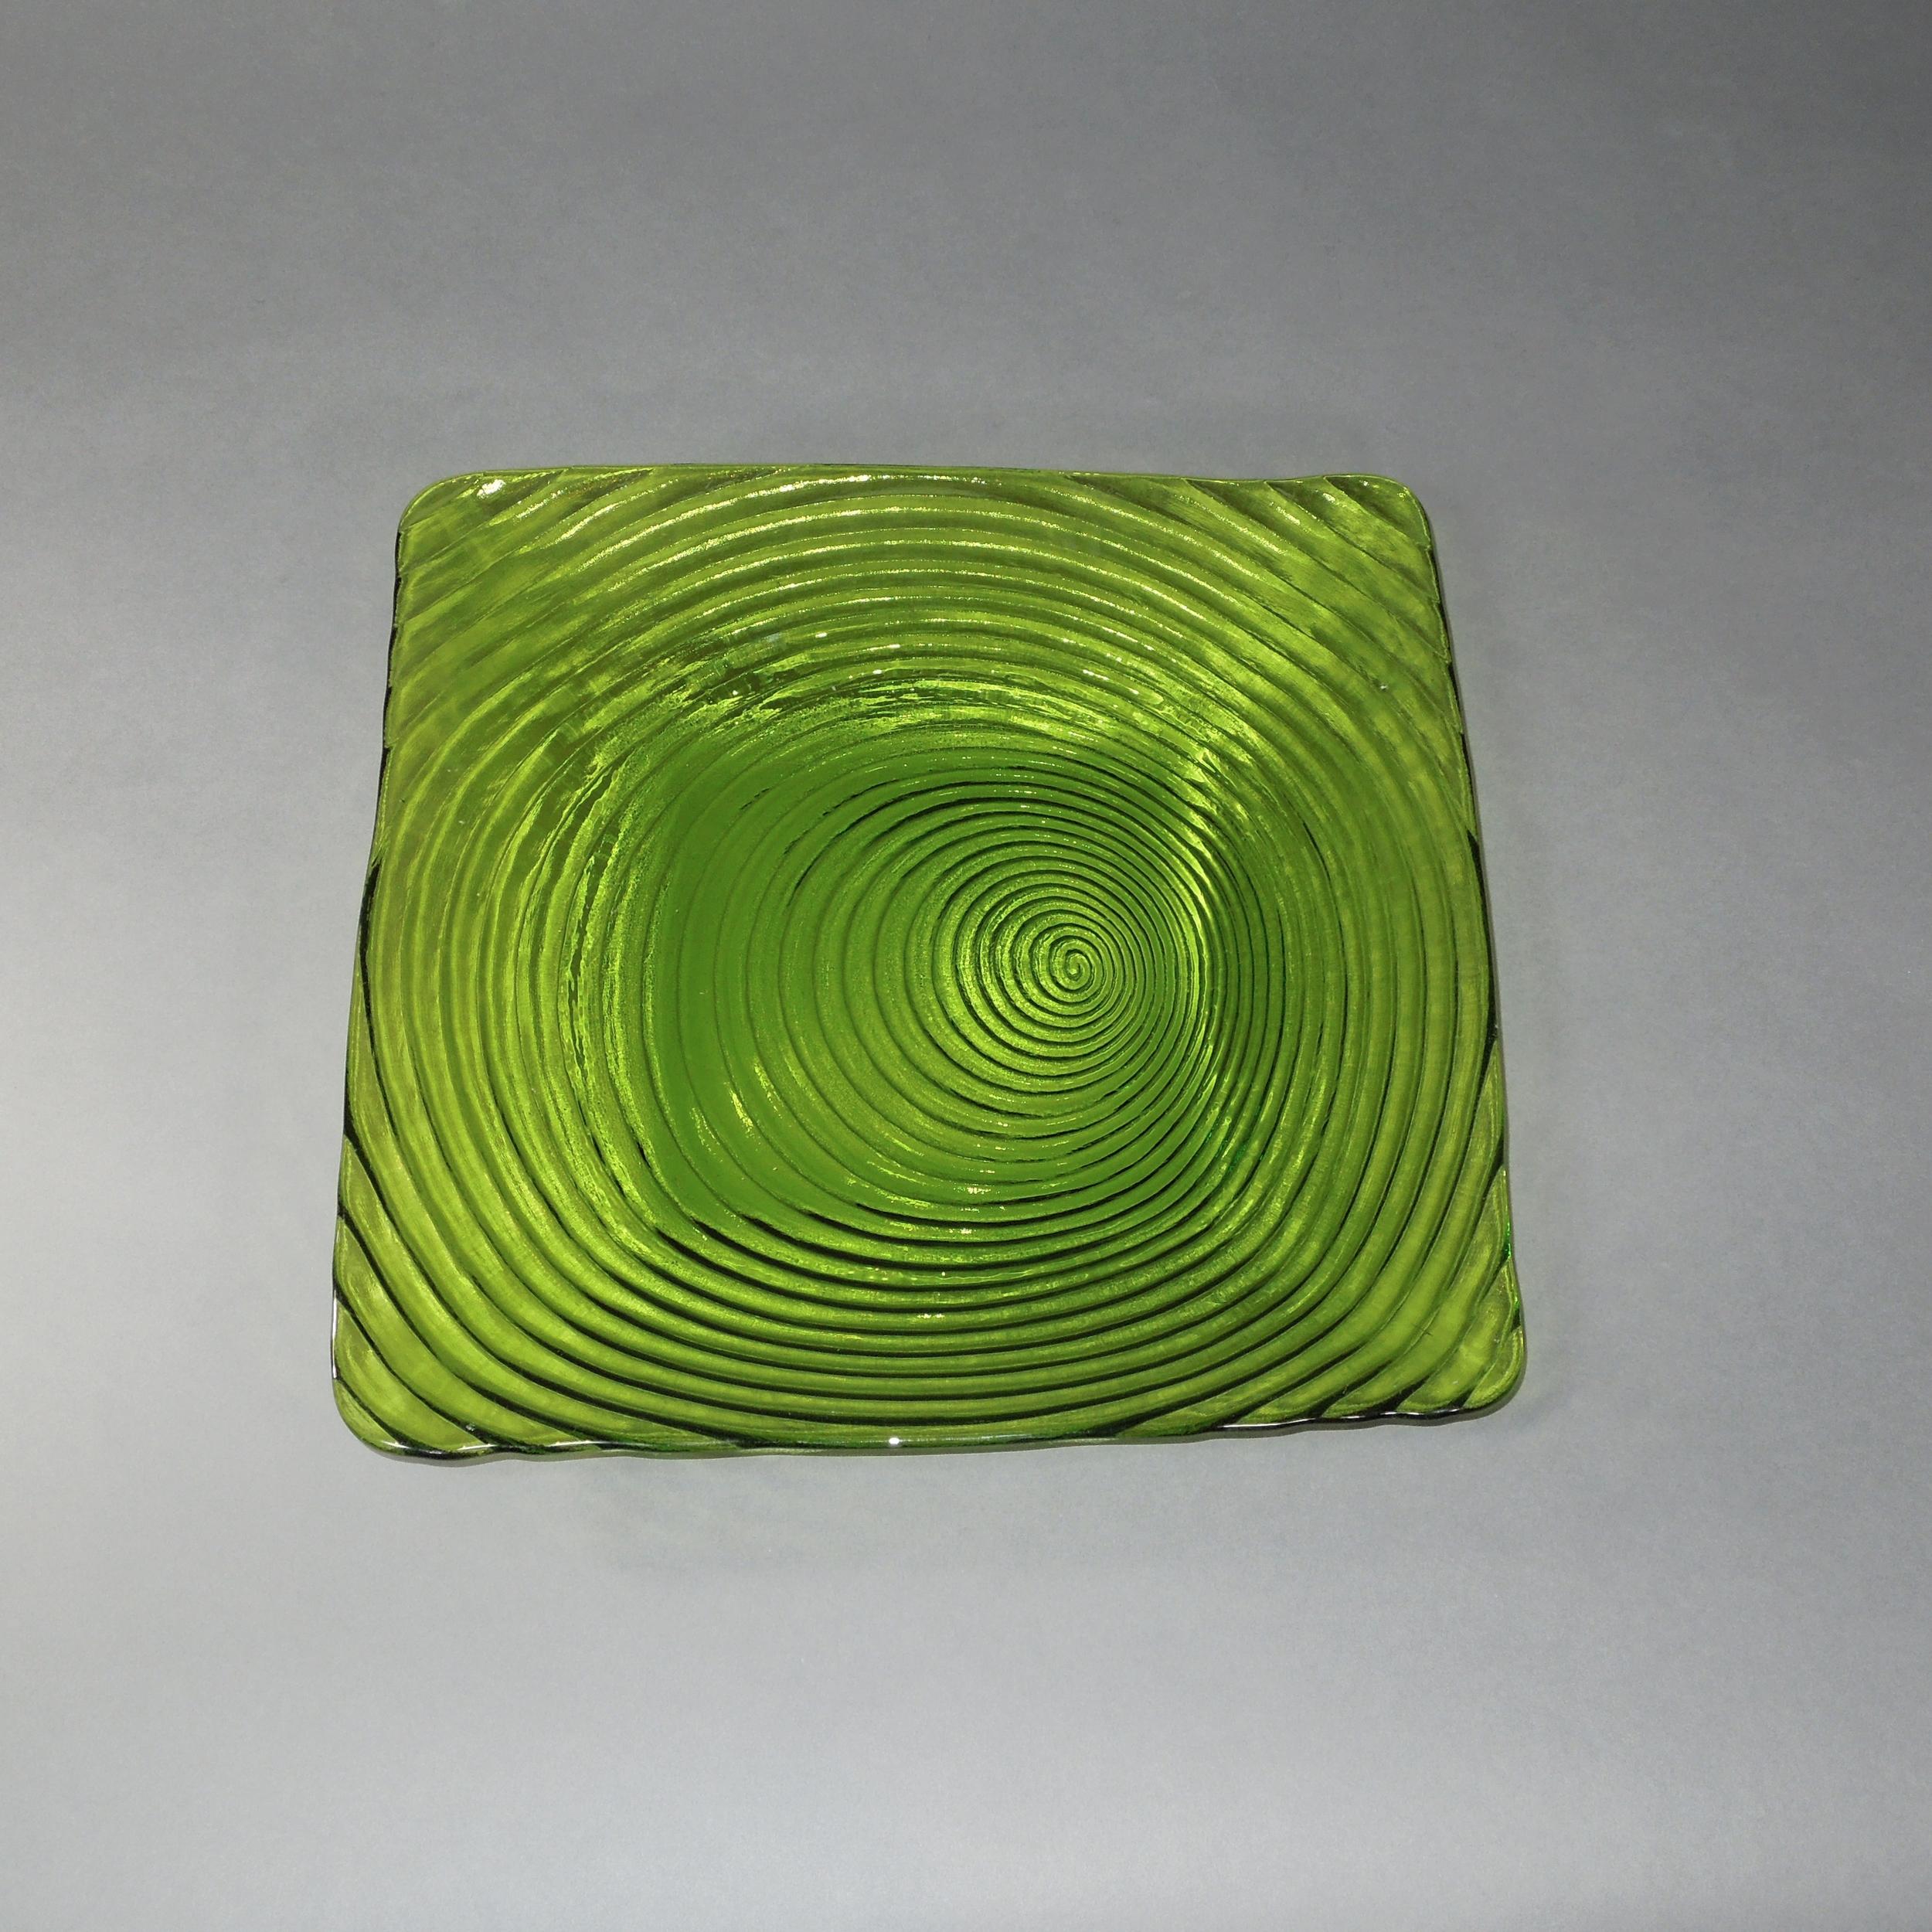 Square Plates - Green